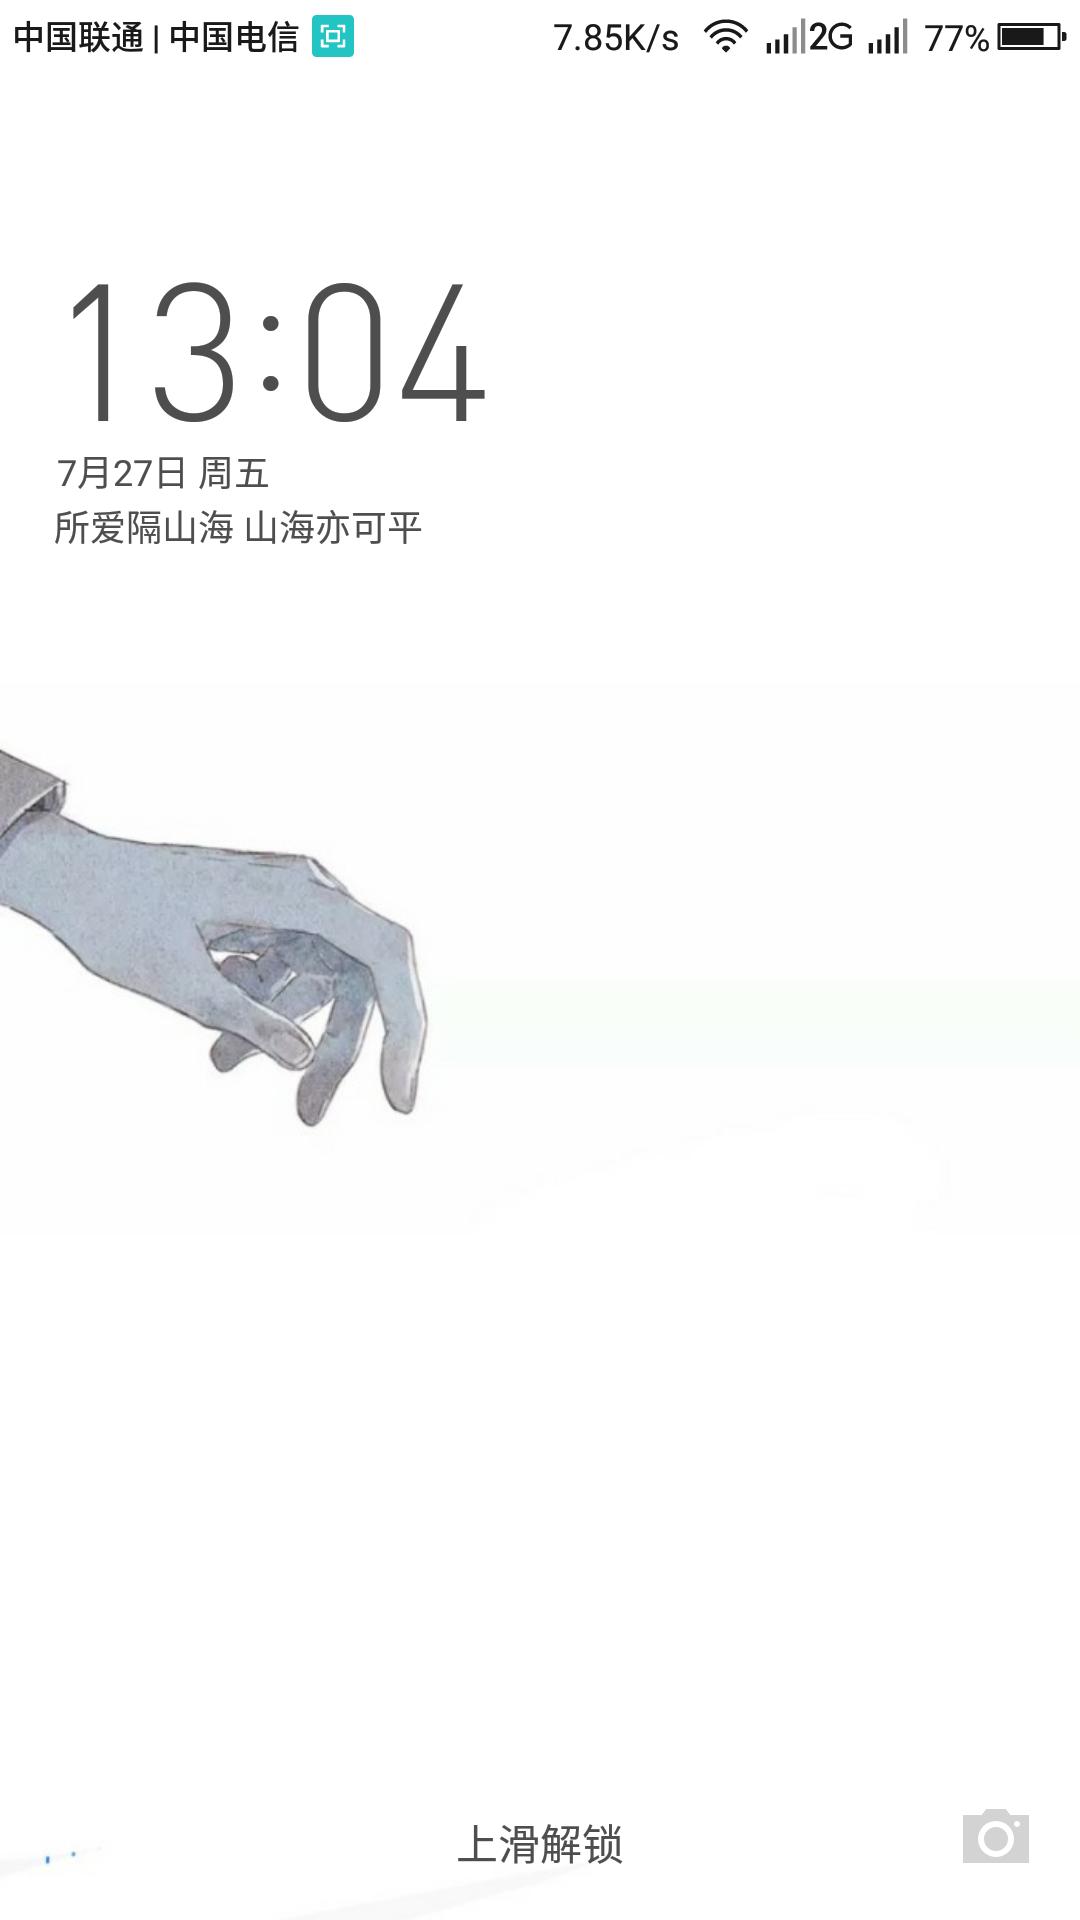 Screenshot_2018-07-27-13-04-21.png